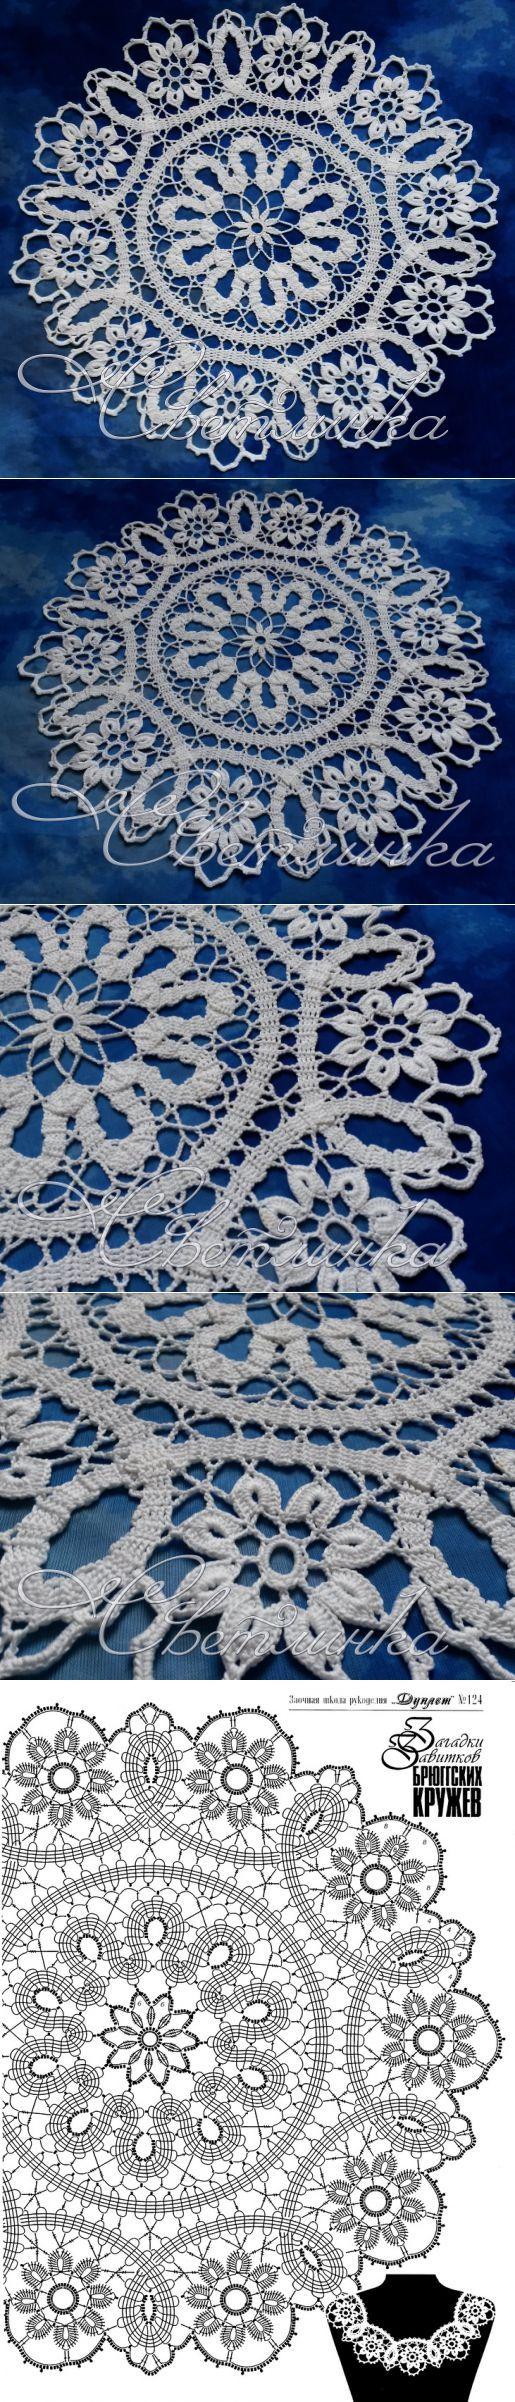 165 best bruges crochet lace images on pinterest carpets lace bankloansurffo Image collections